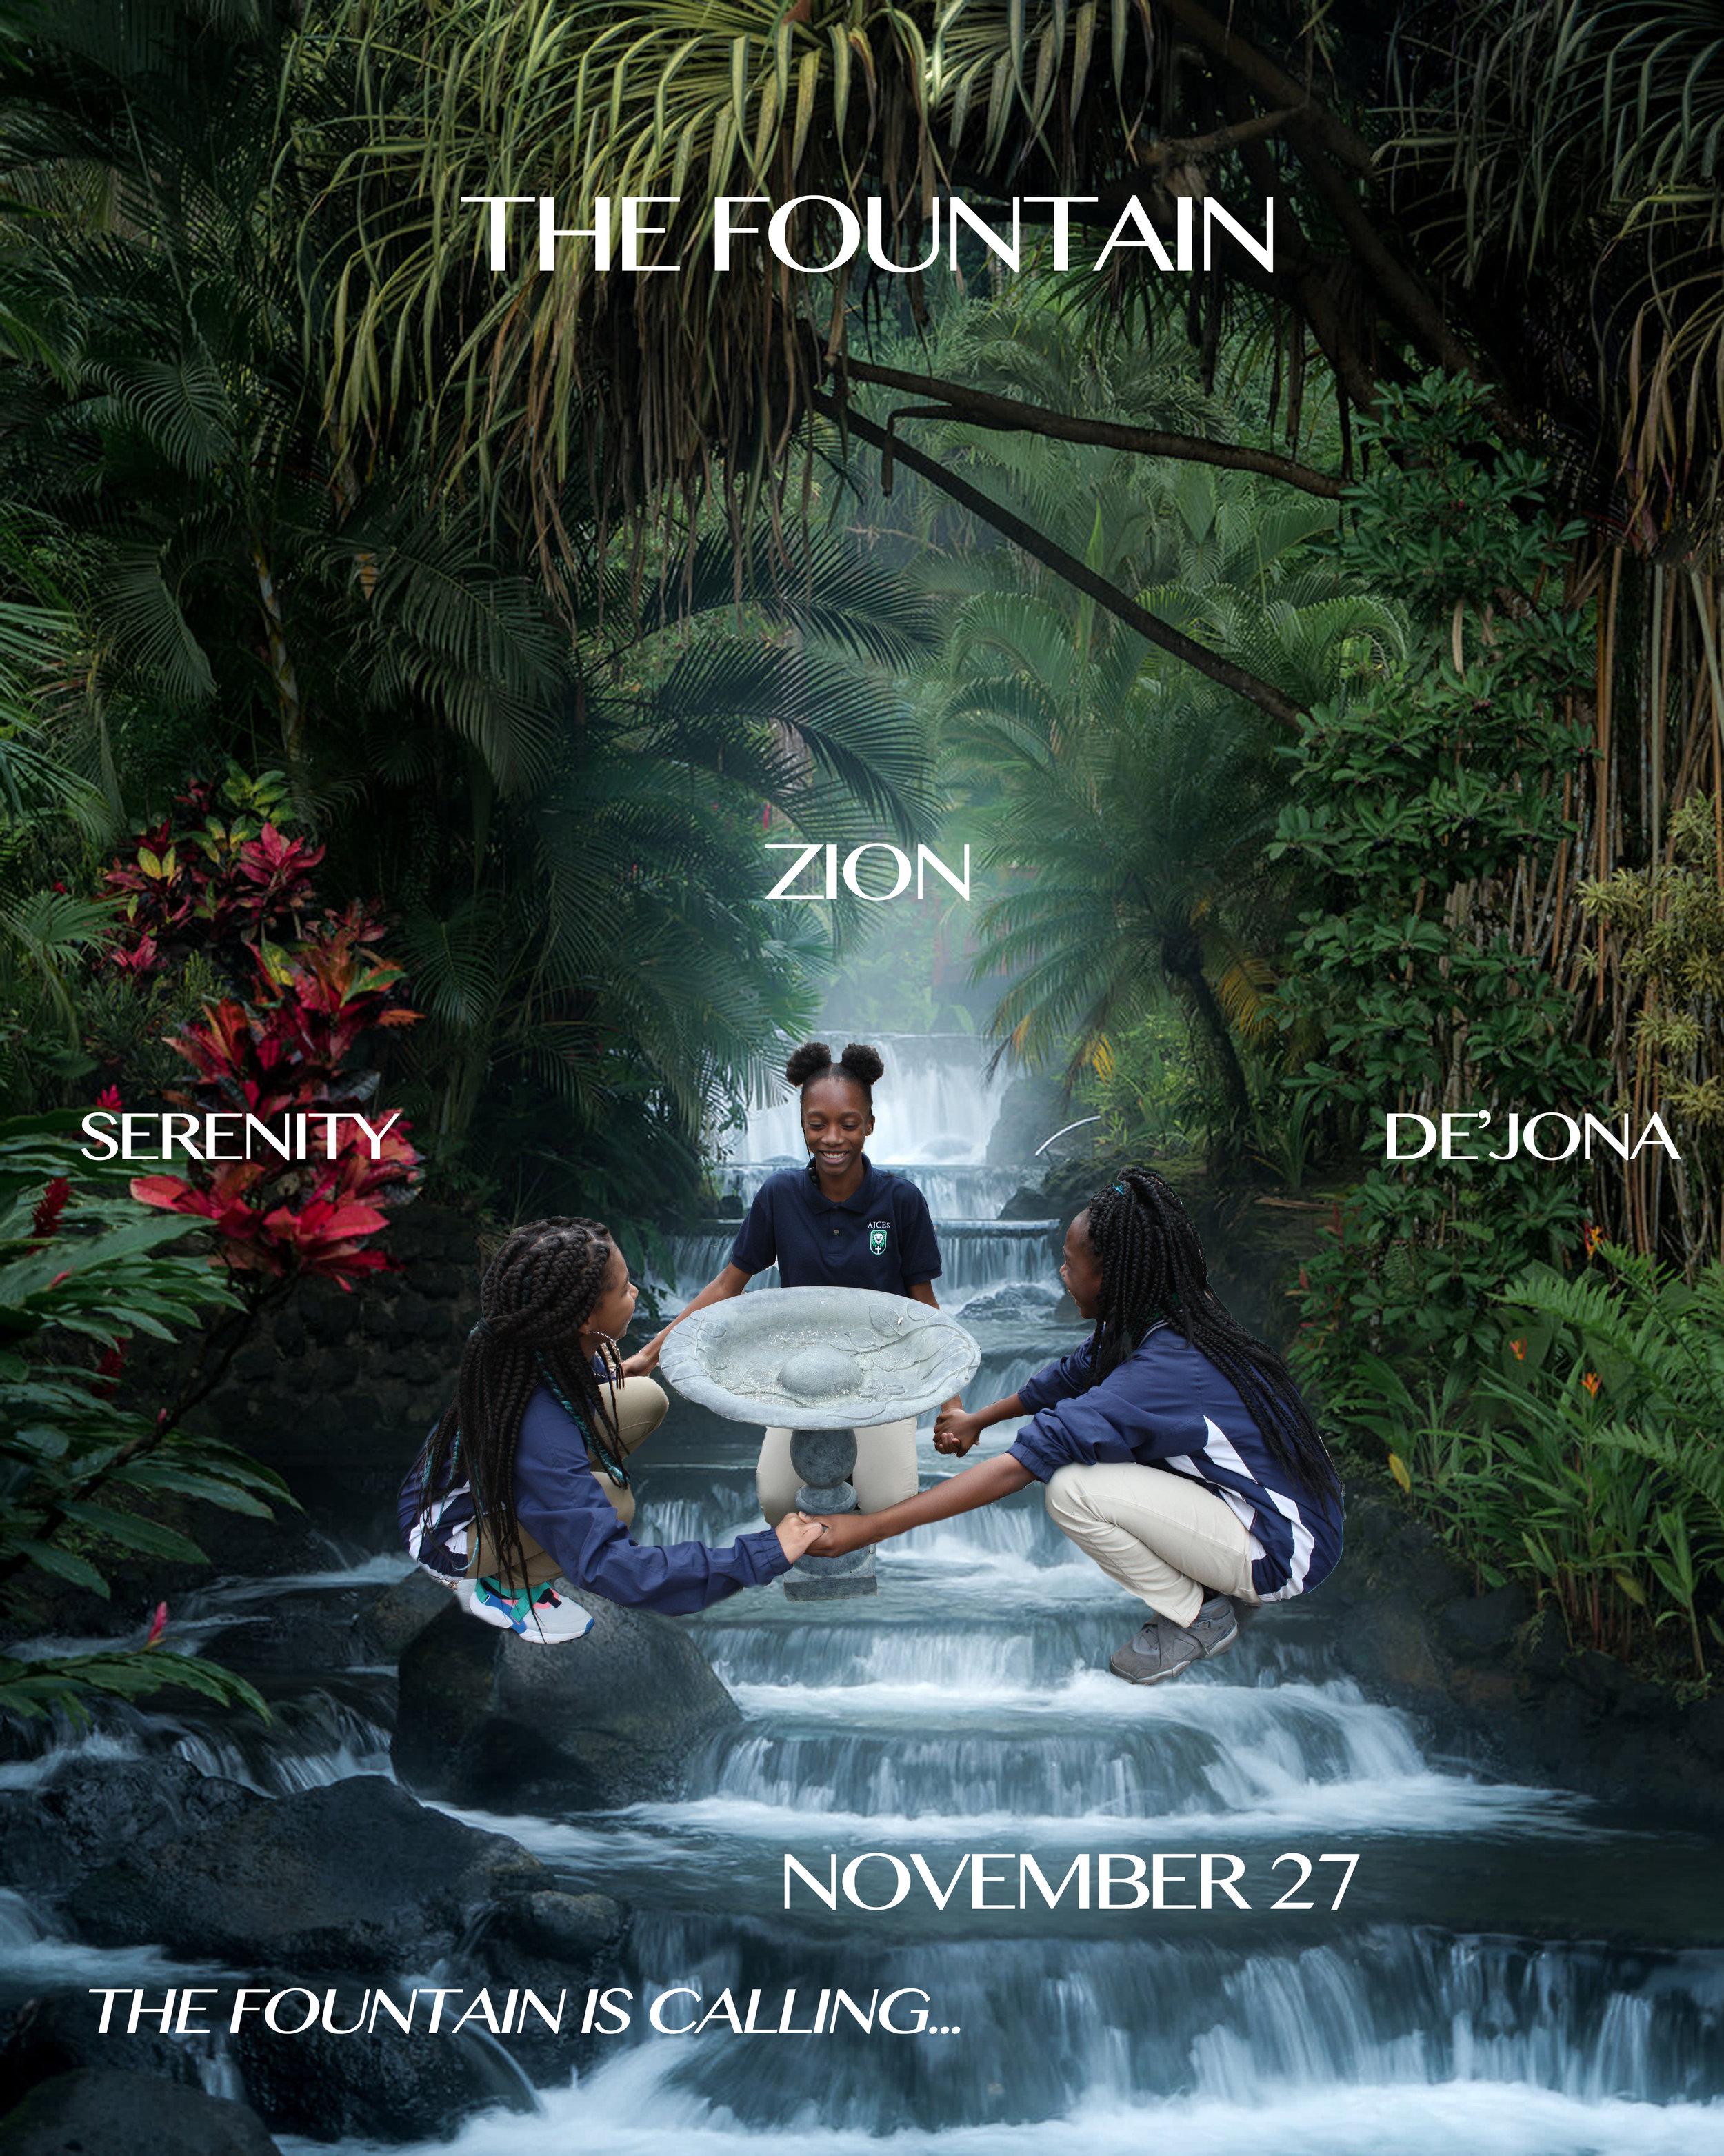 AJC-Dejona Serenity Zion, FINAL waterfall poster.jpg